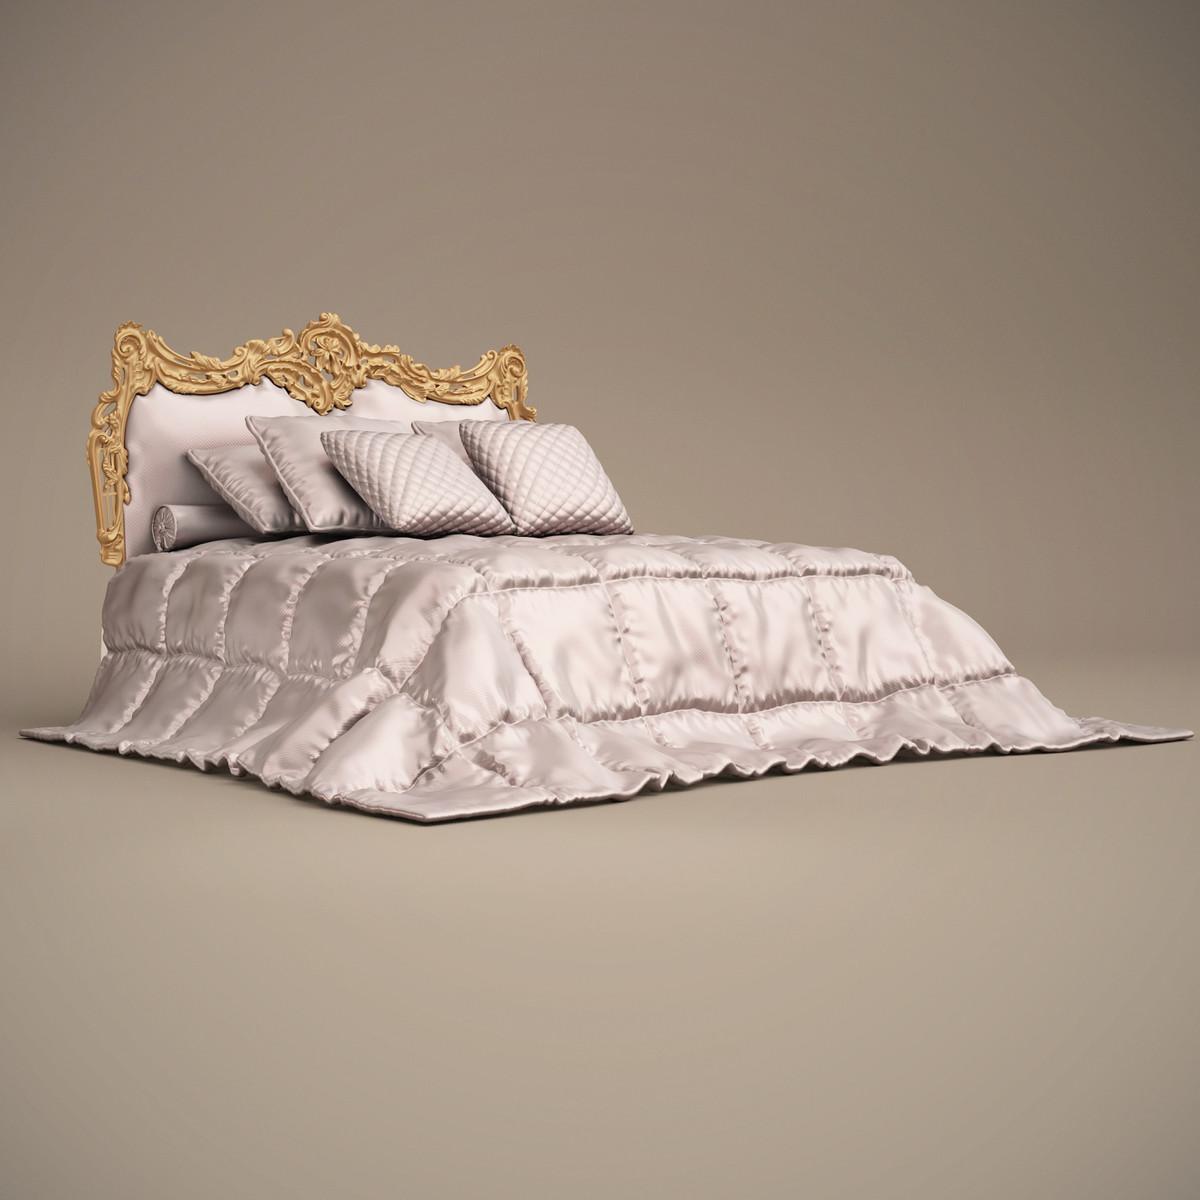 jumbo bed her-02 max